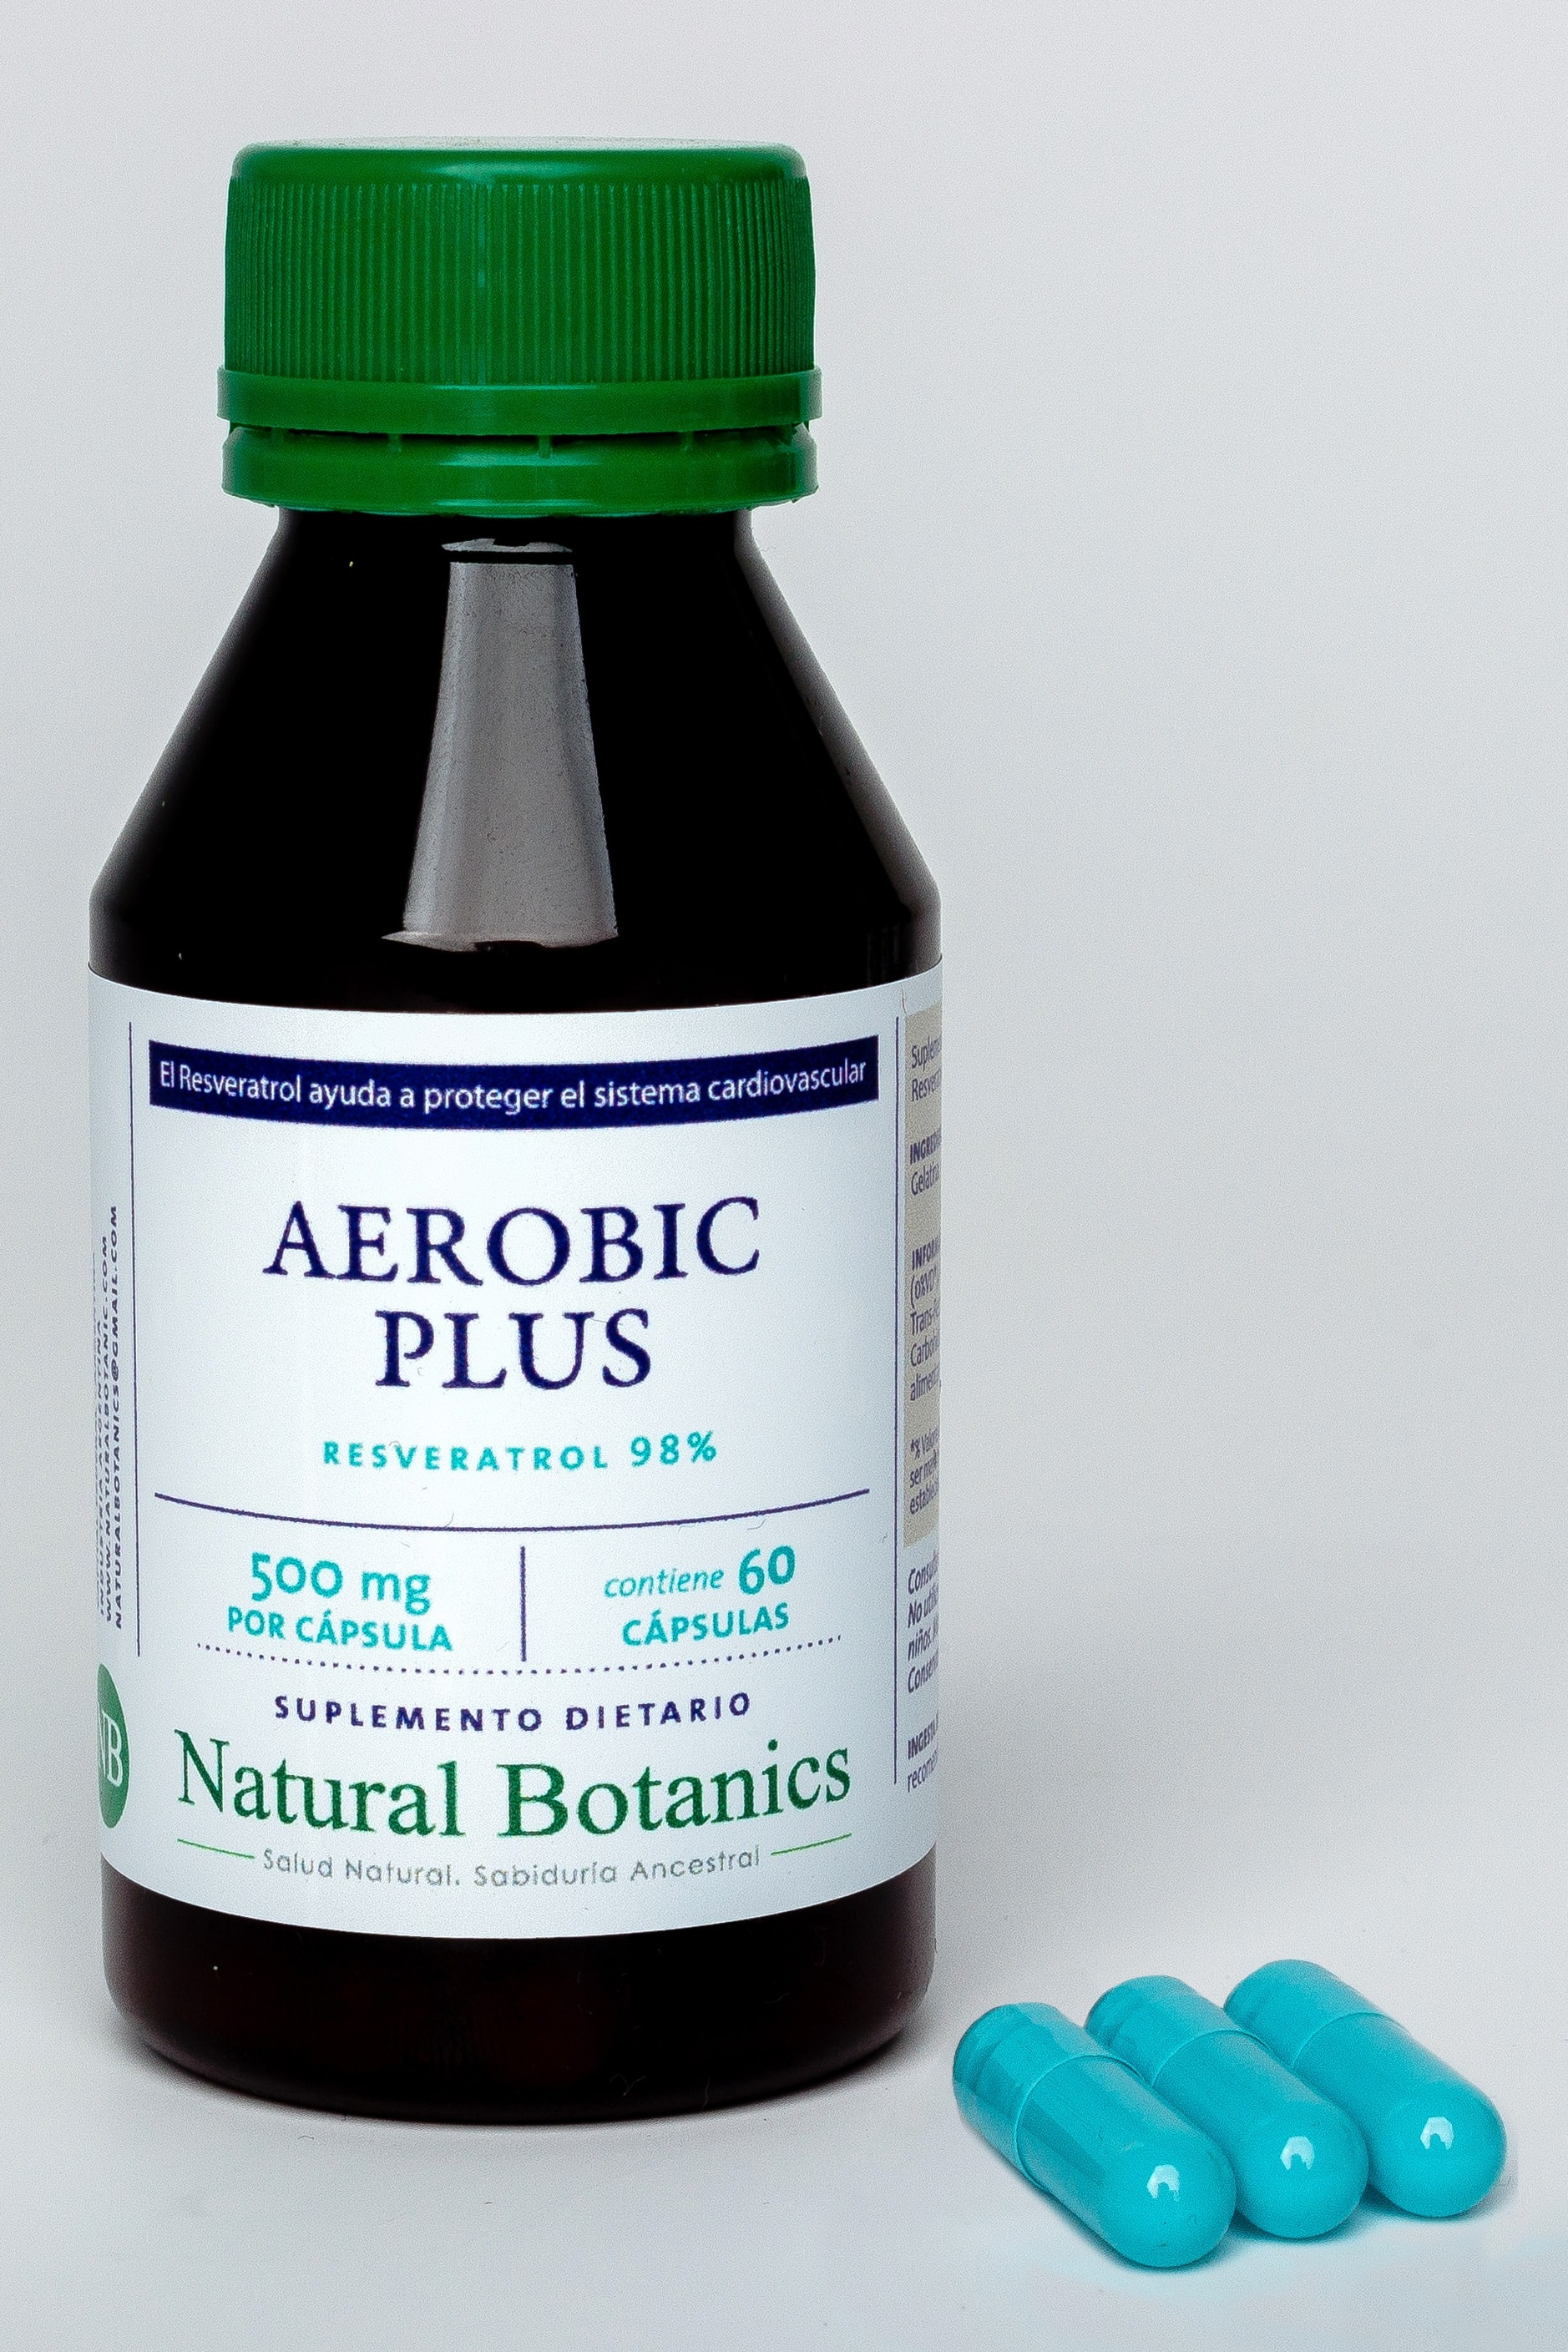 Aerobic+Plus+4-min.jpg